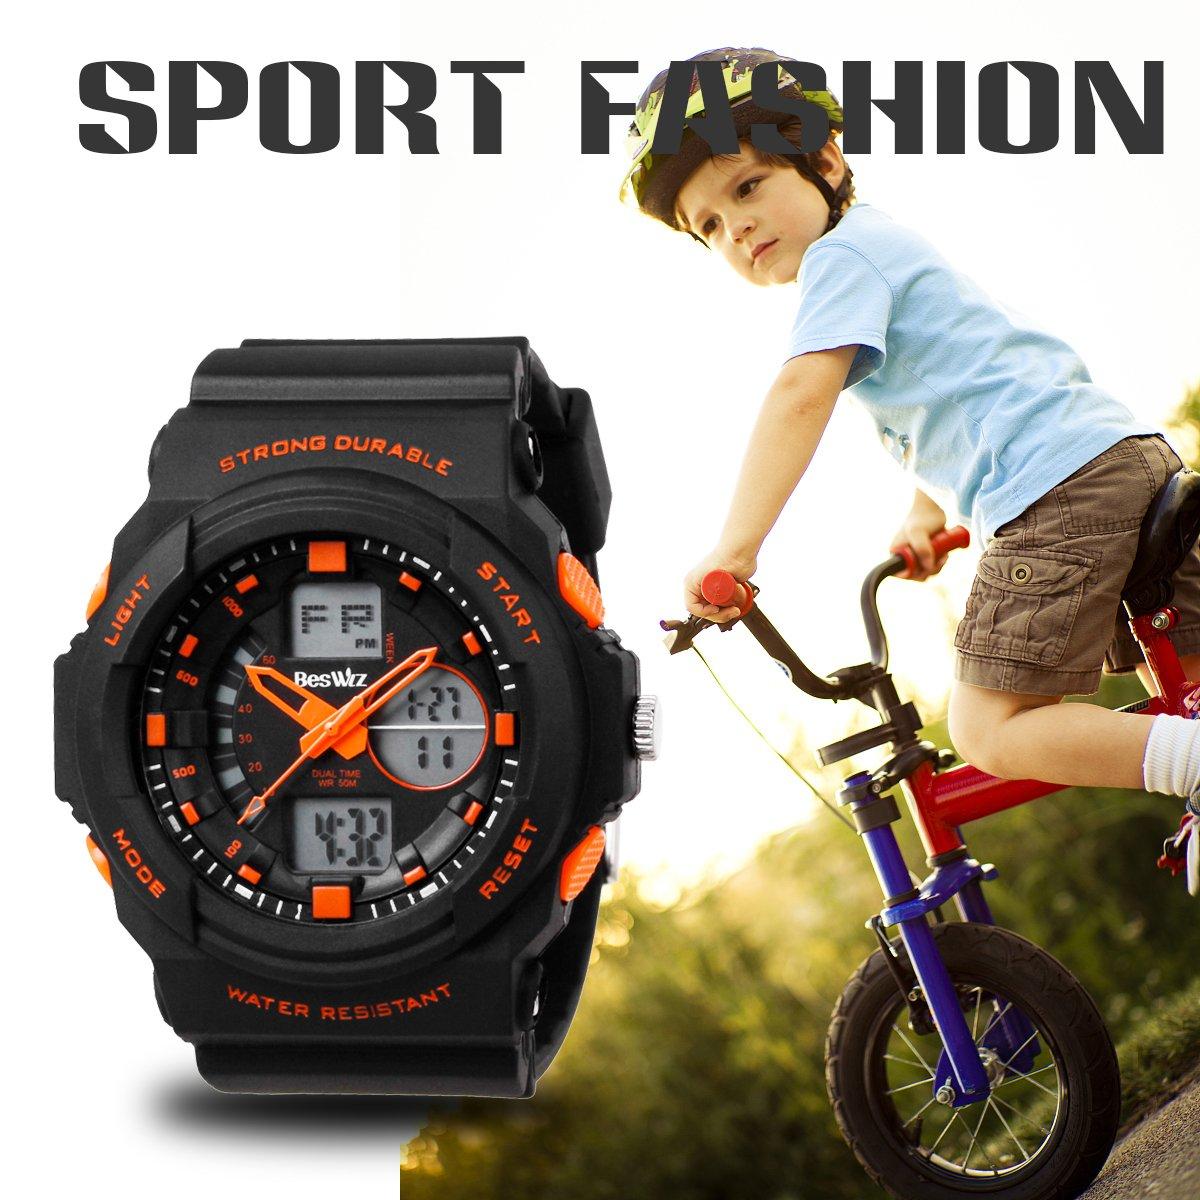 BesWLZ Multi Function Digital LED Quartz Watch Water Resistant Electronic Sport Watches Child Orange by BesWlz (Image #6)